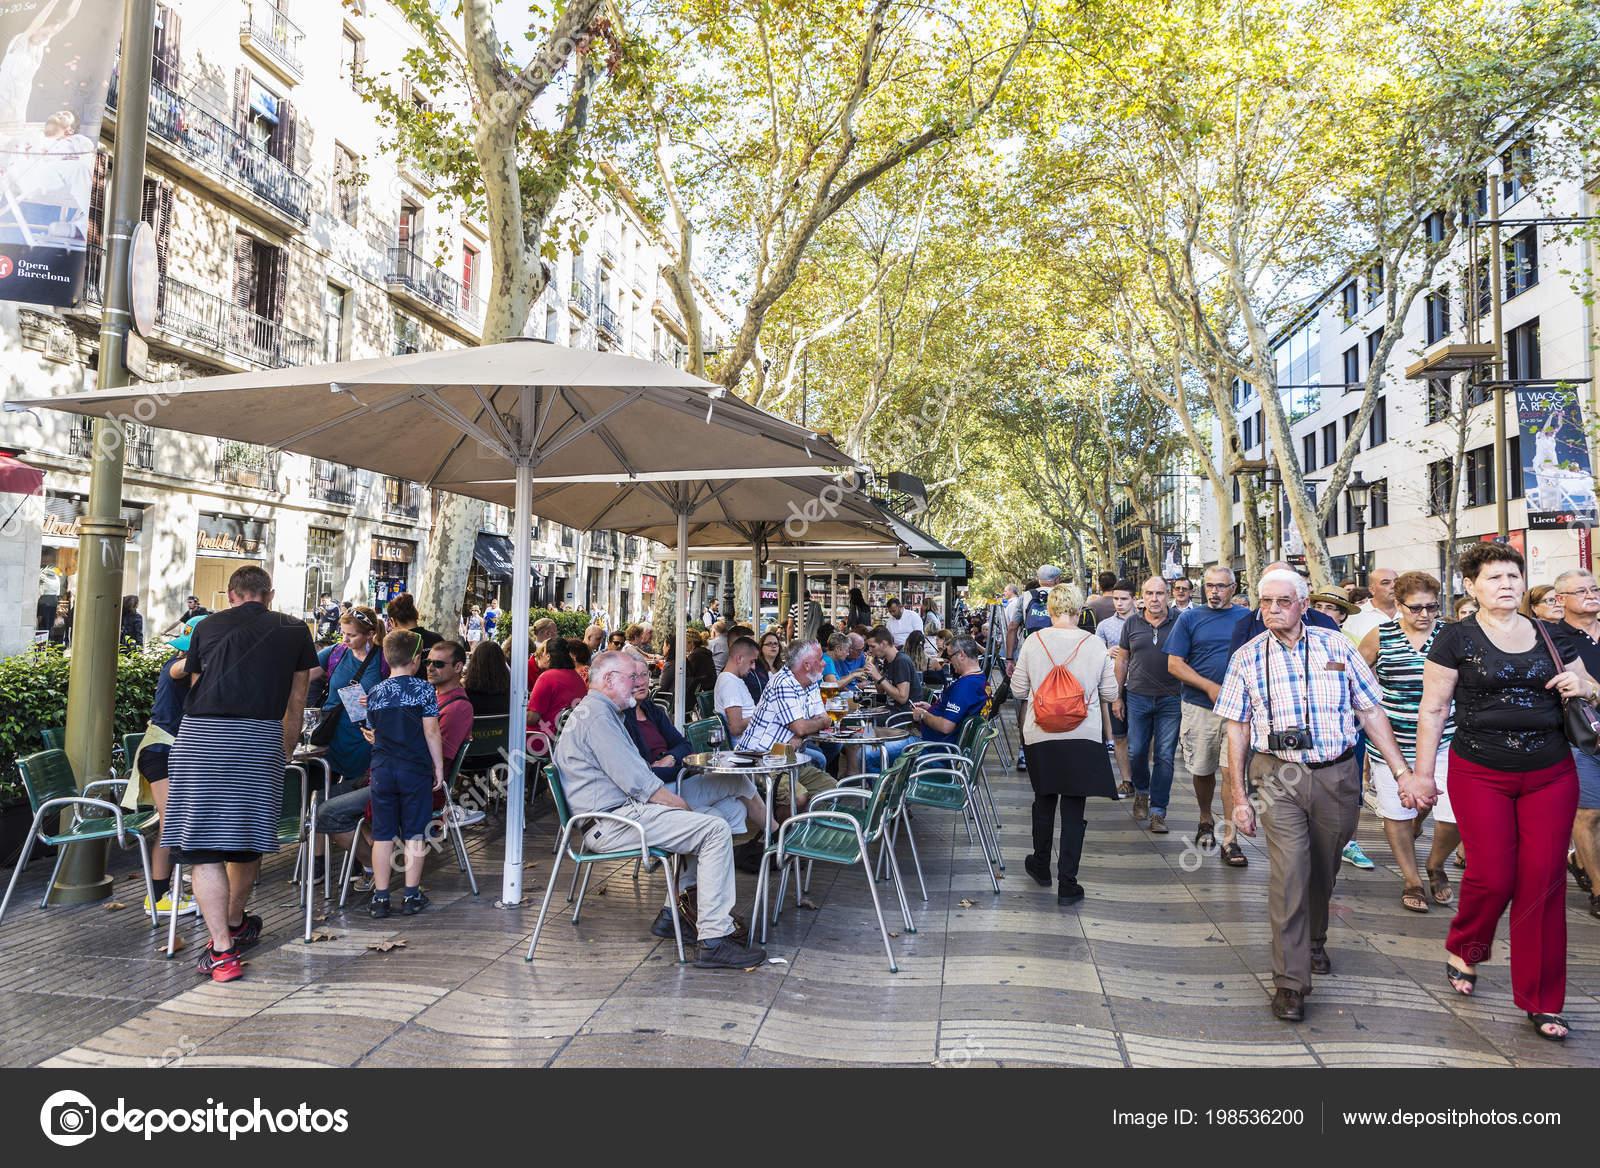 Barcelona Spain September 2017 Terrace Bar People Walking